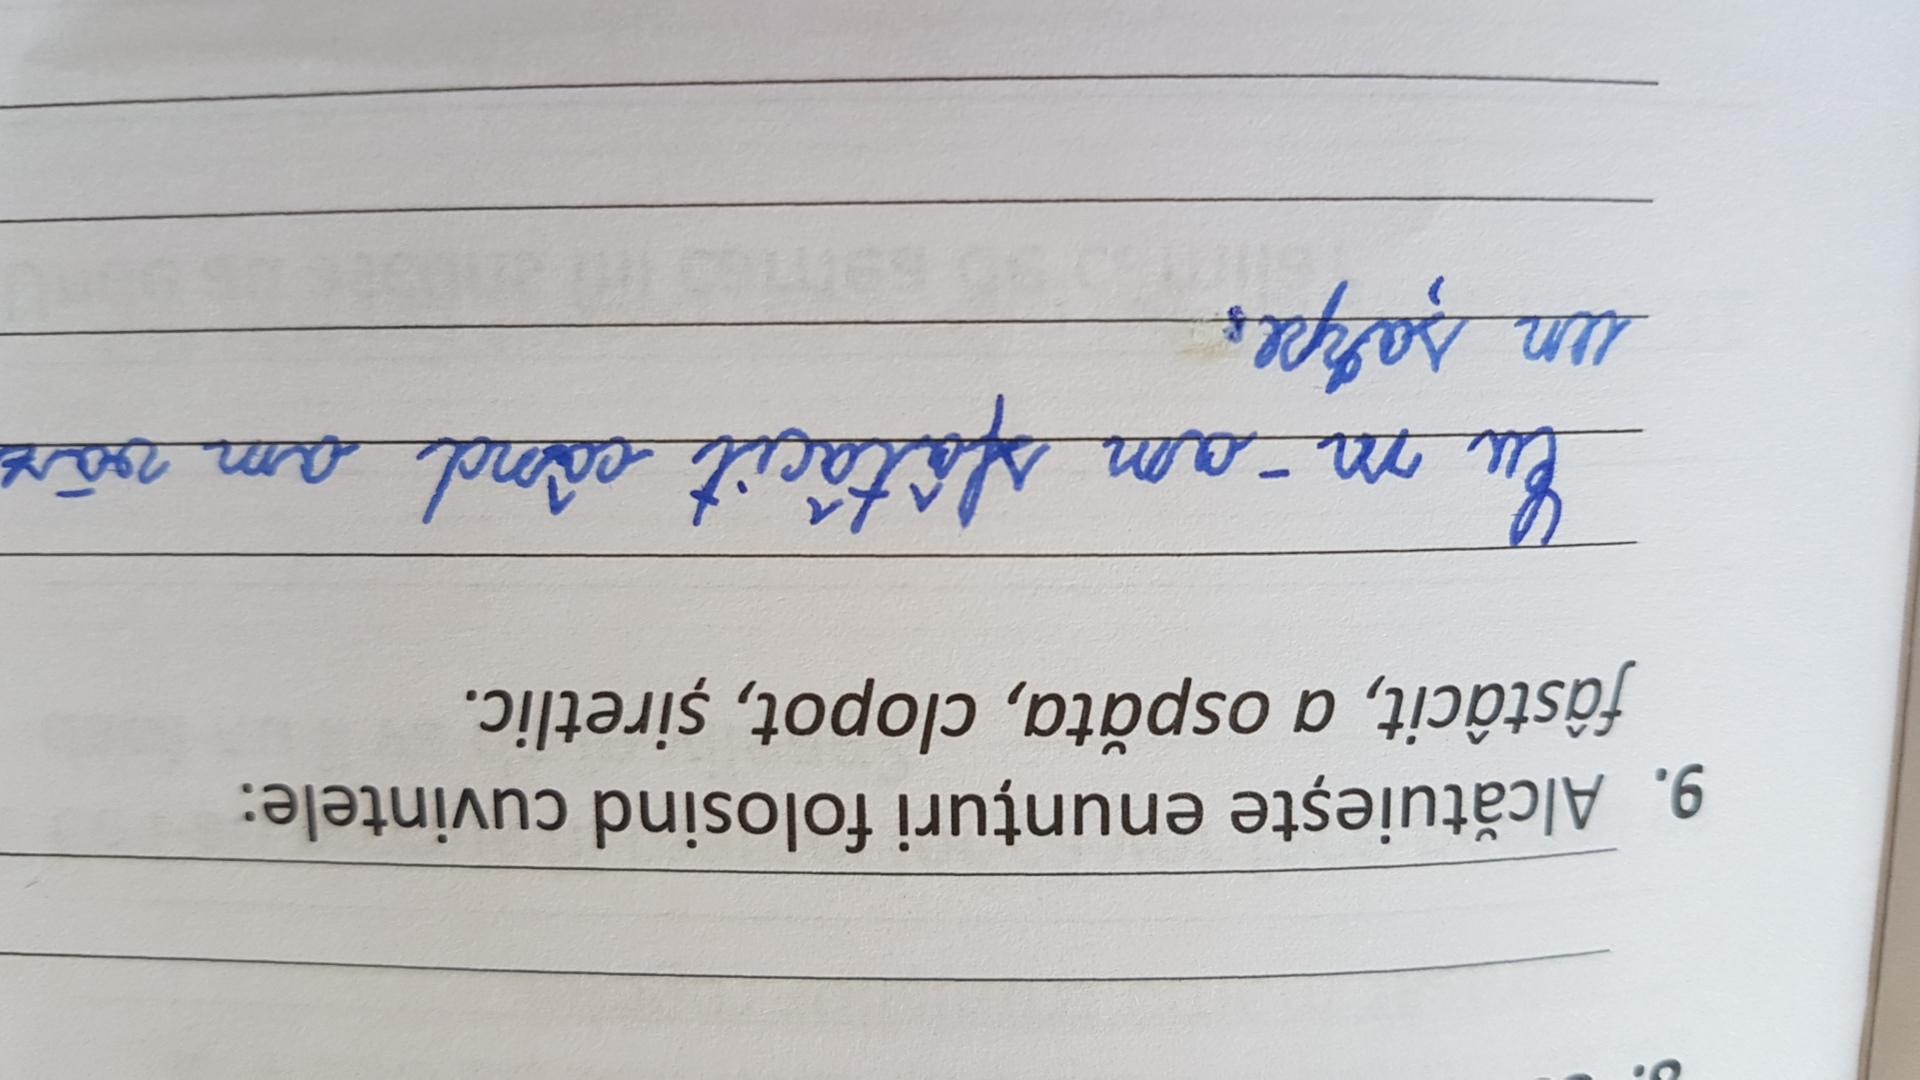 Varice este o propoziție